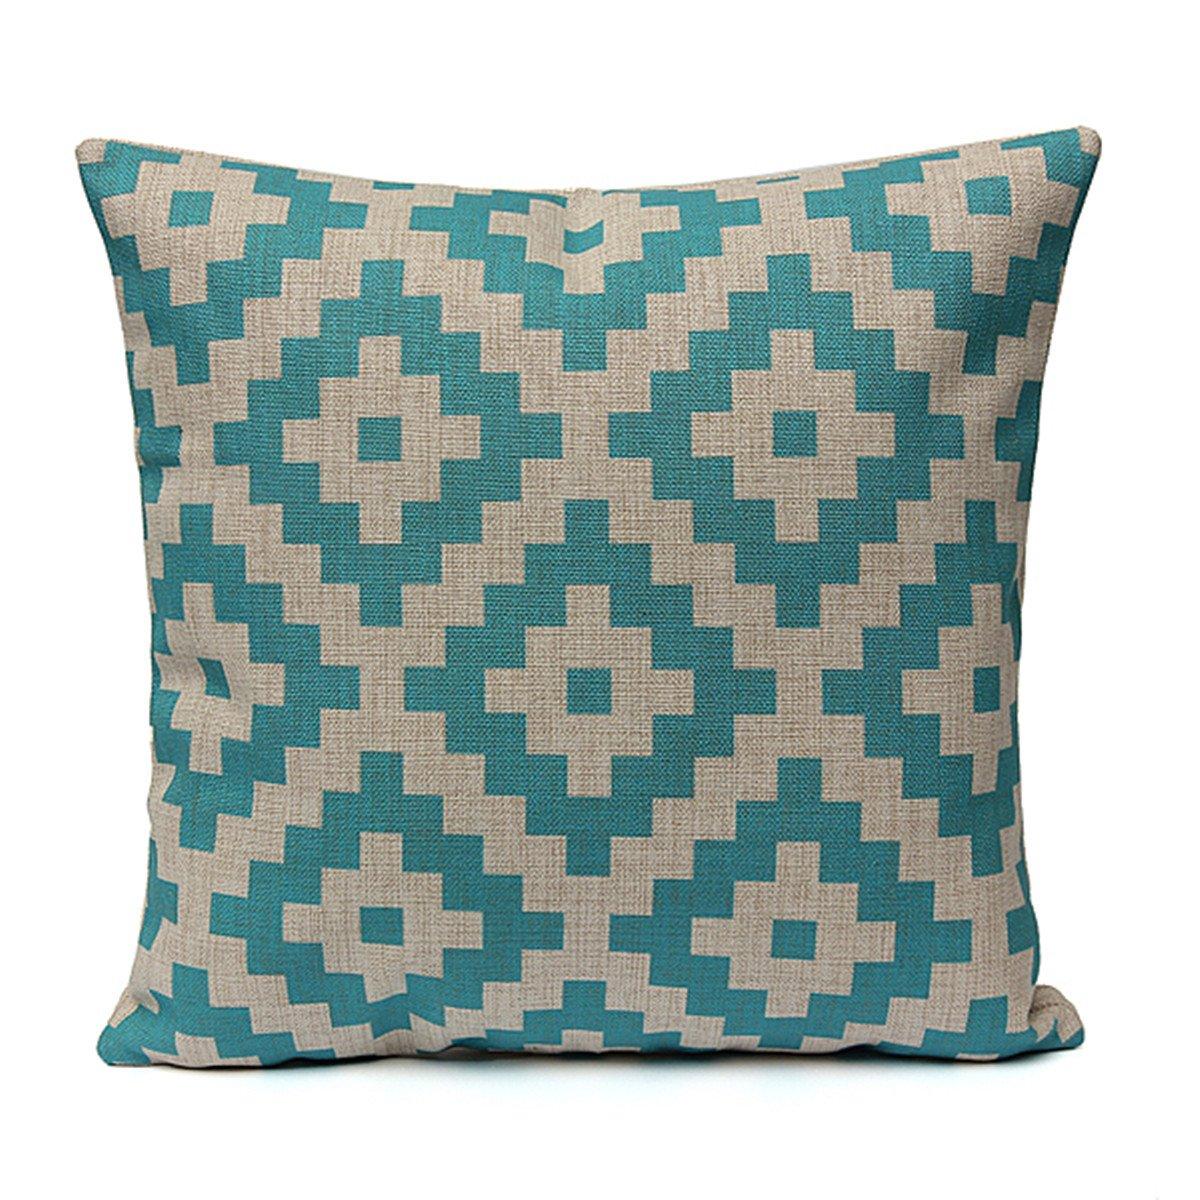 Throw Pillow Material : Geometric Cotton Linen Cushion Cover Throw Pillow Case Sofa Car Home Decorative eBay